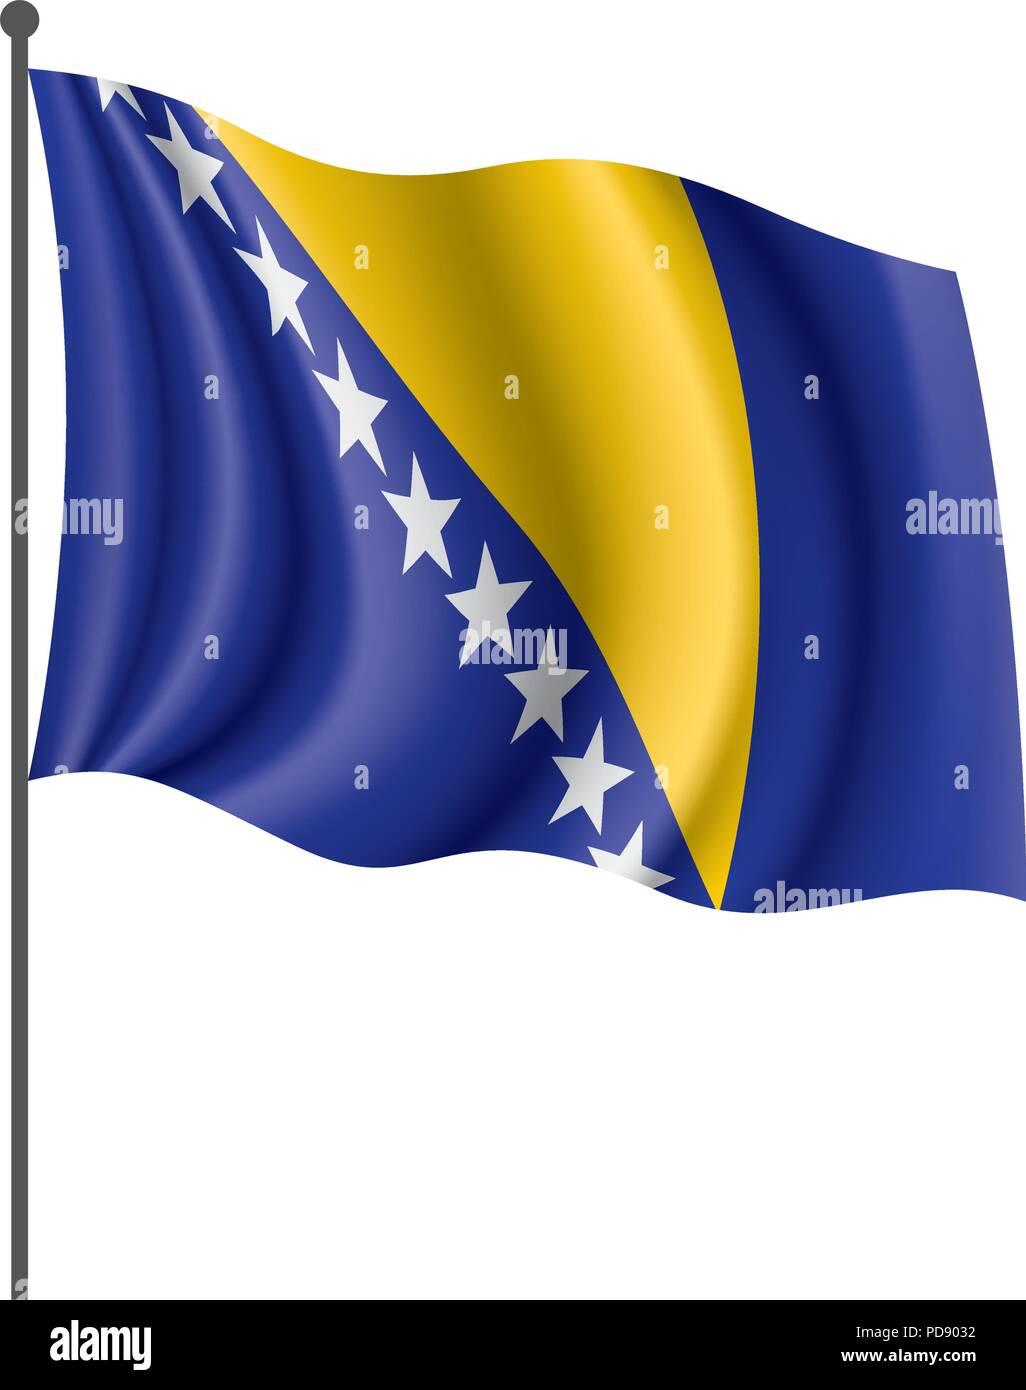 Bosnia and Herzegovina flag, vector illustration - Stock Vector